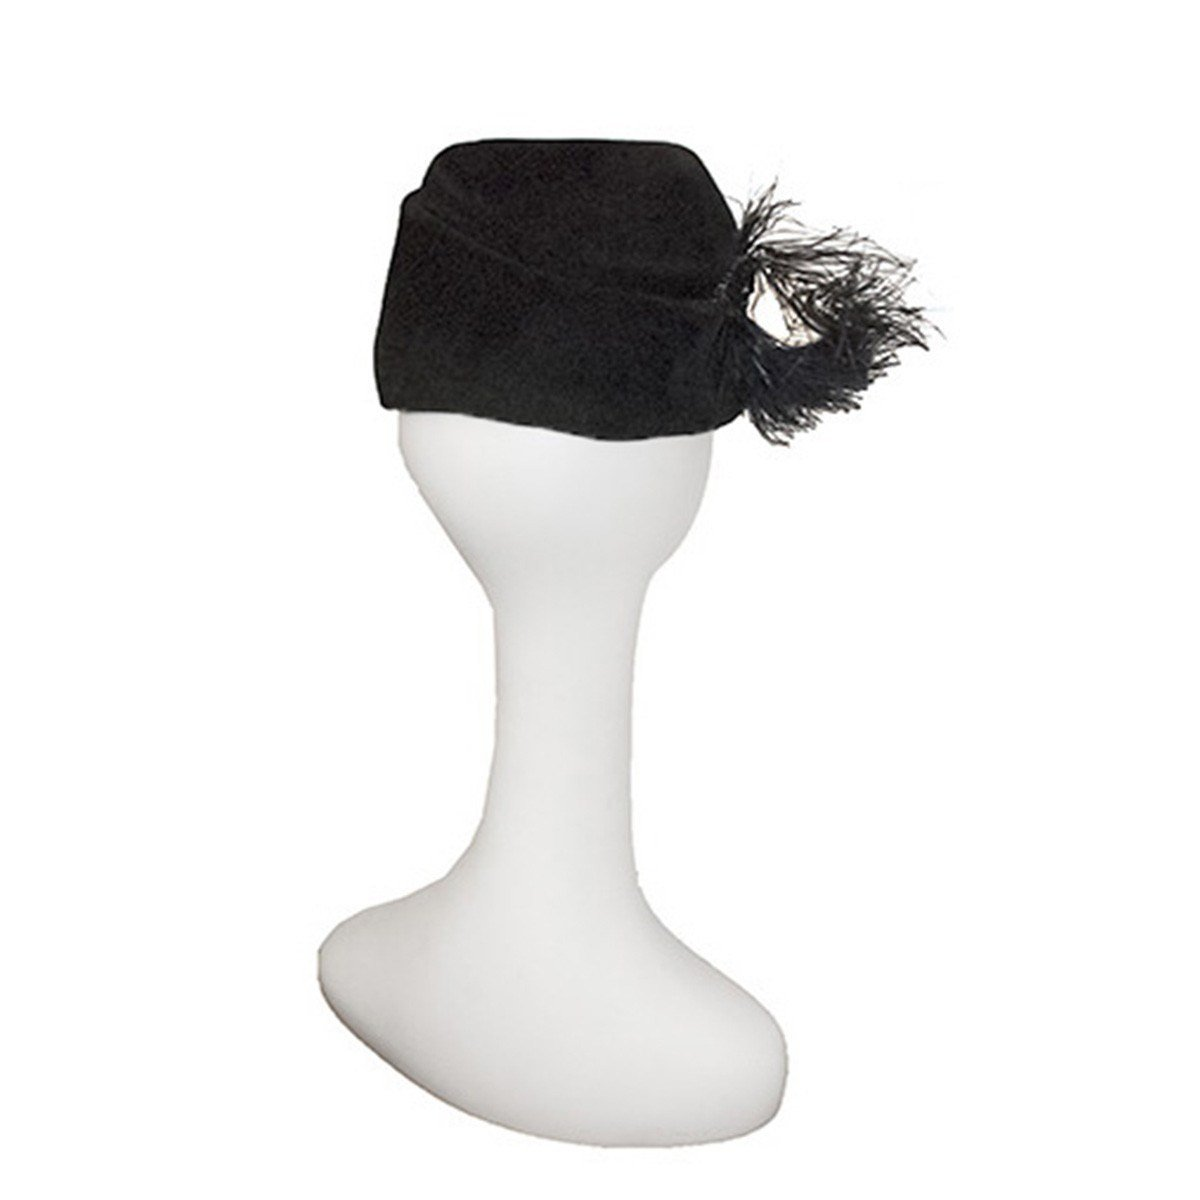 1940s Cocktail Hat, Black Velour Felt, Feathers & Beading, Hat Size 20